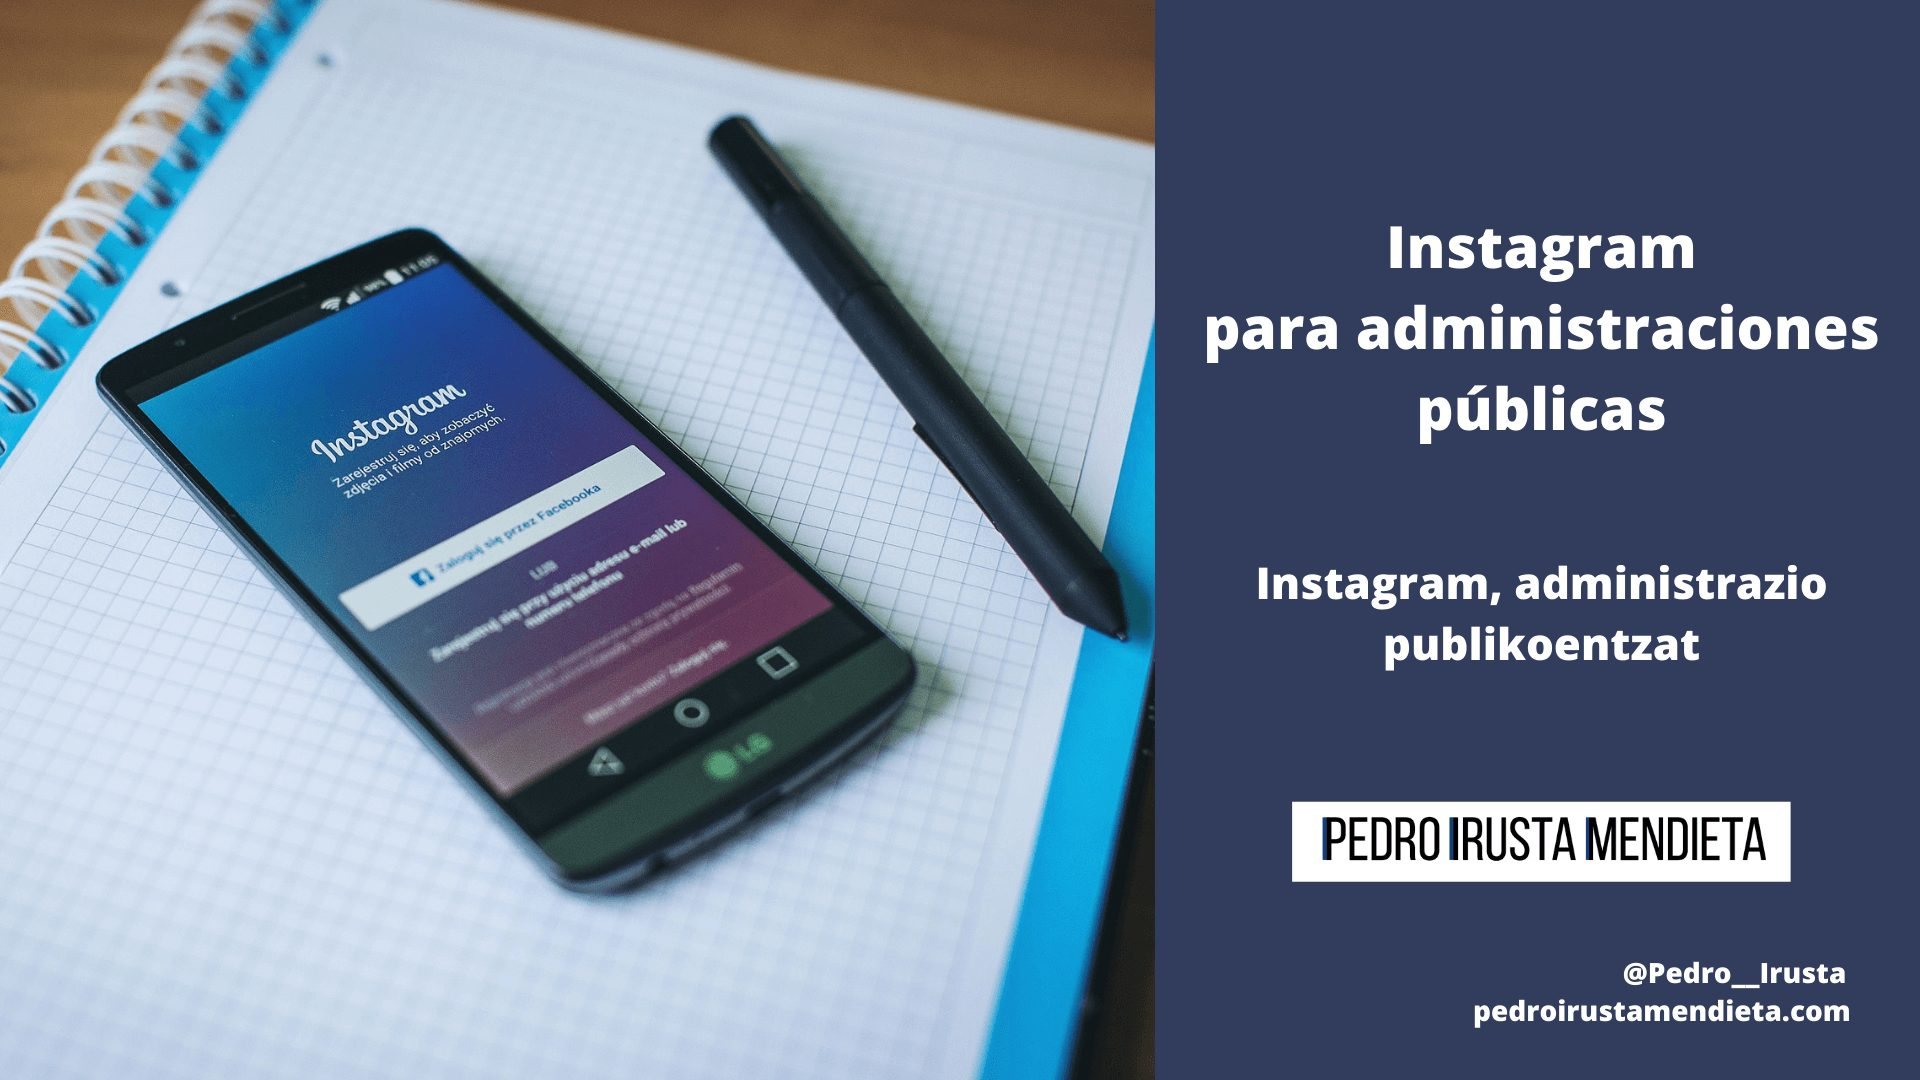 Instagram administrazio publikoentzat